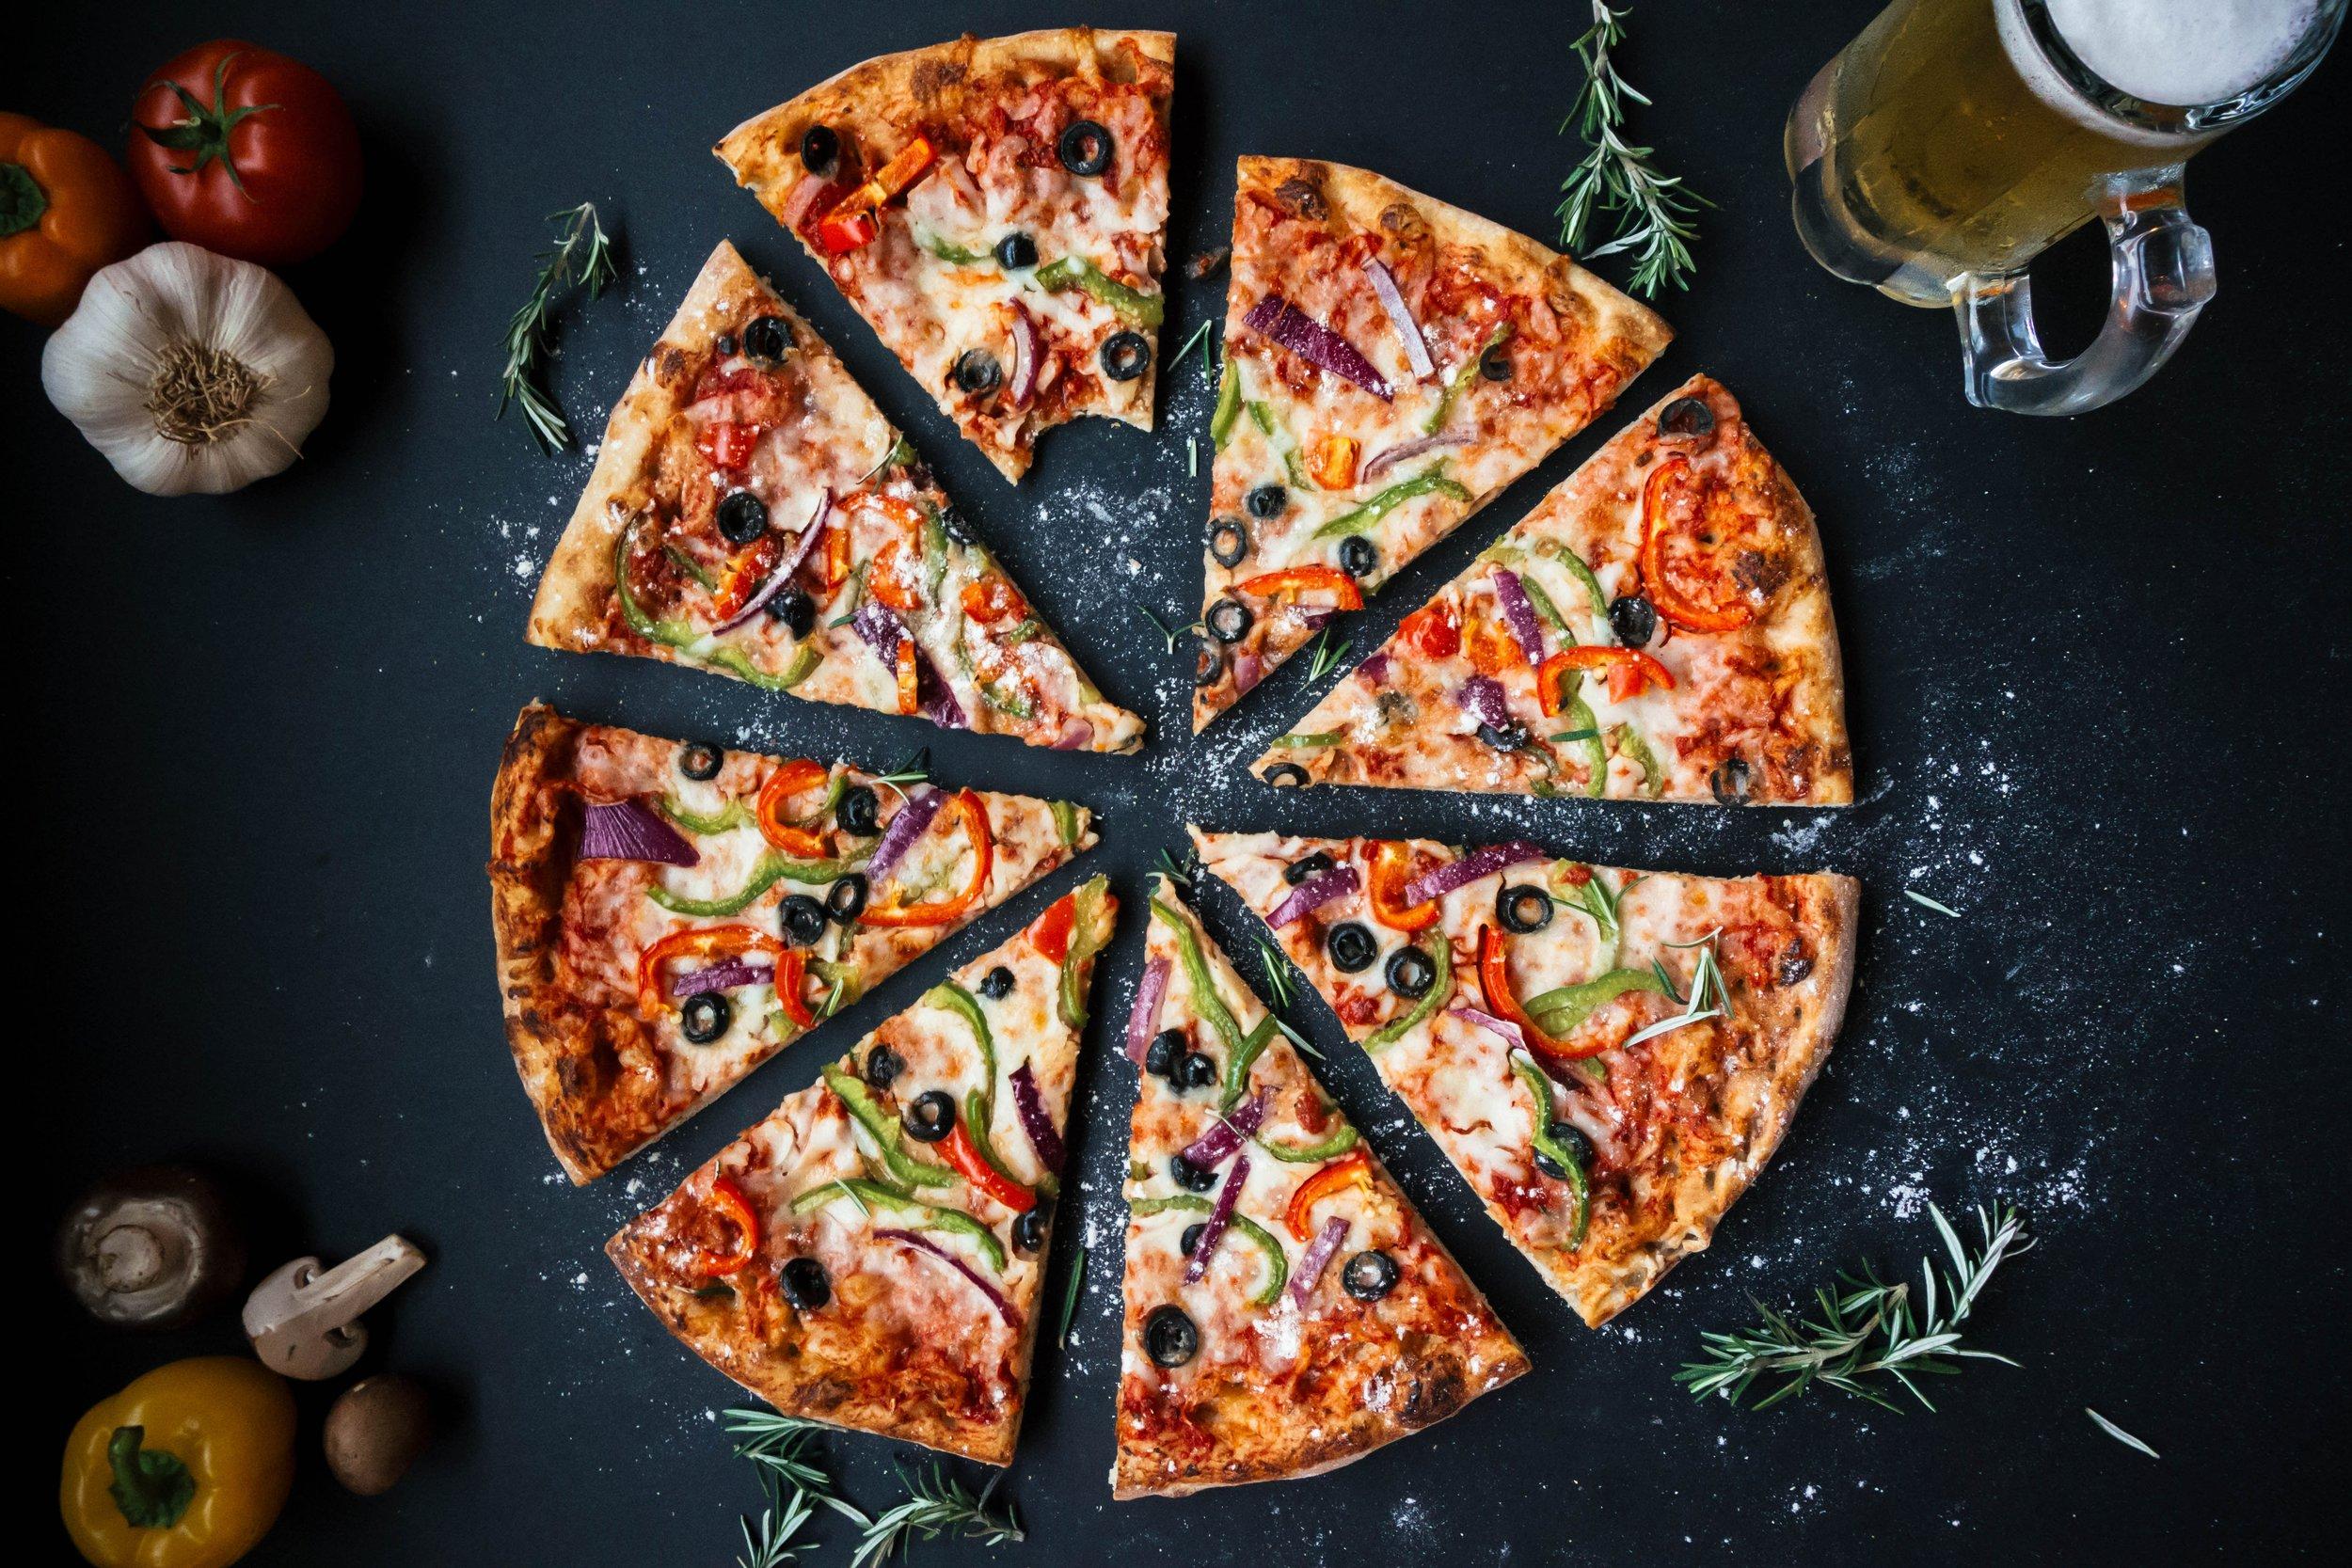 - Preparation time: 15 minProofing time: 60-90 minCooking time: 15 minServes: 4 medium pizzas